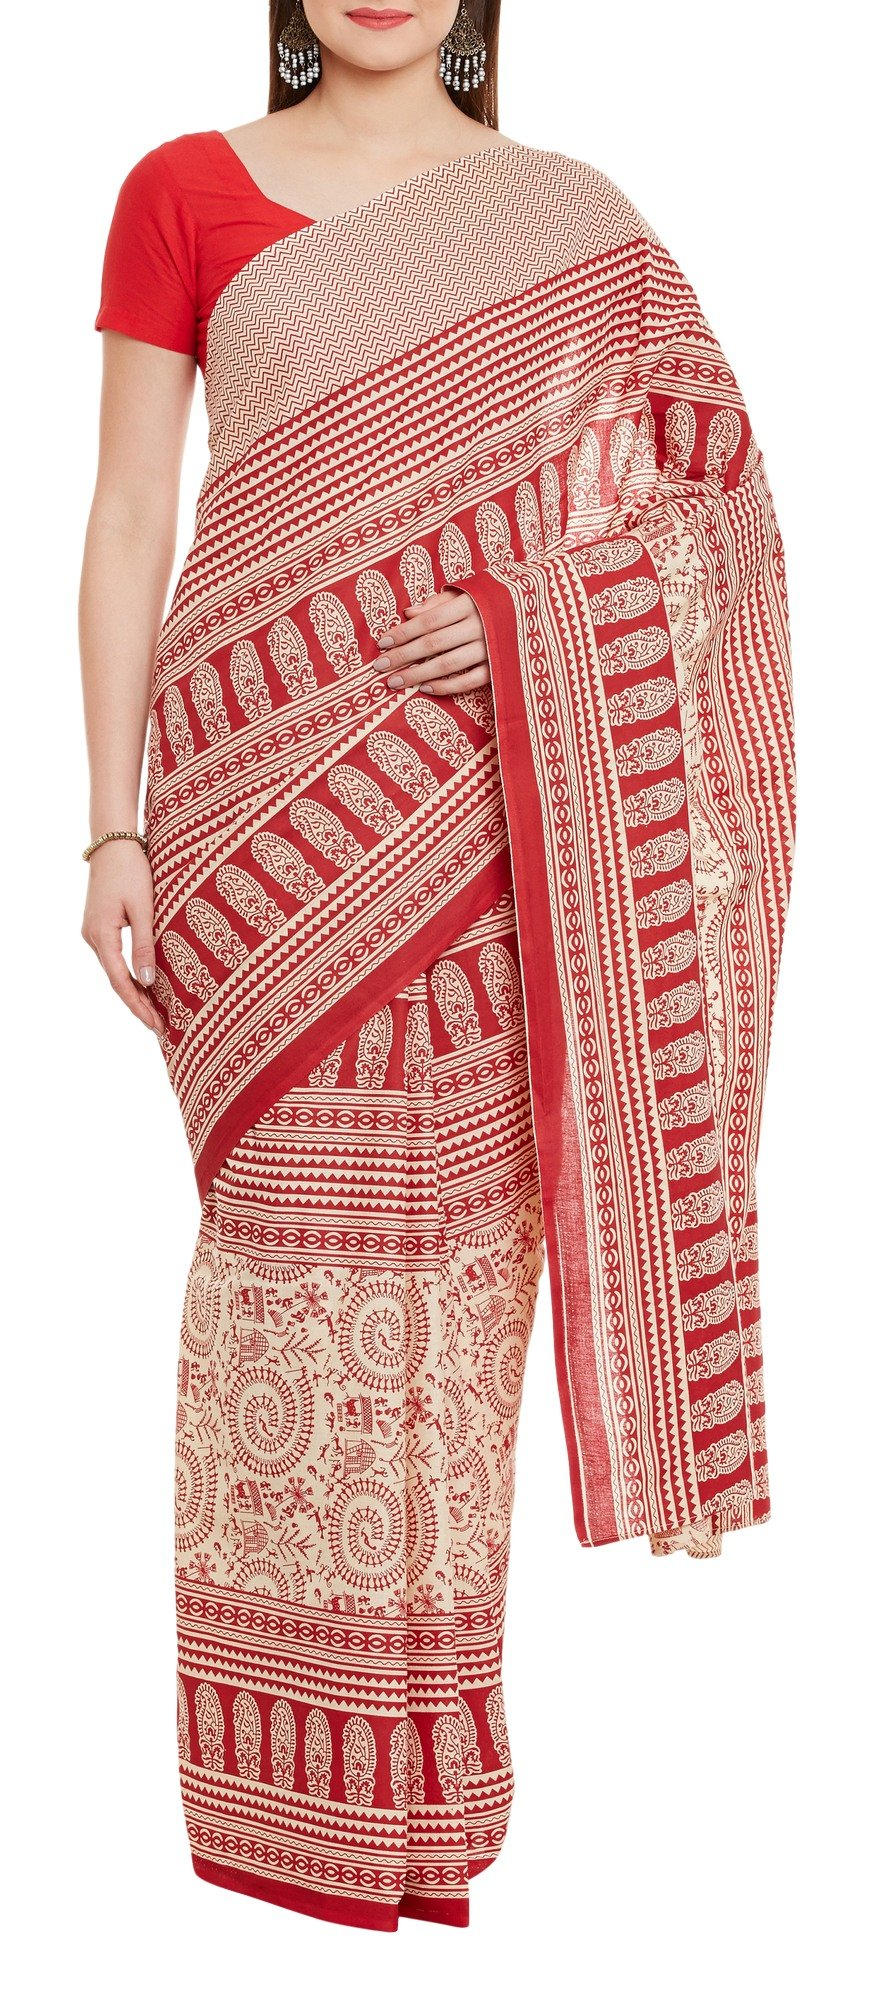 Women's Indian Warli Print Art Saree Cotton Set of 3 Sari Blouse Petticoat Skirt,W-CSR0340-5001